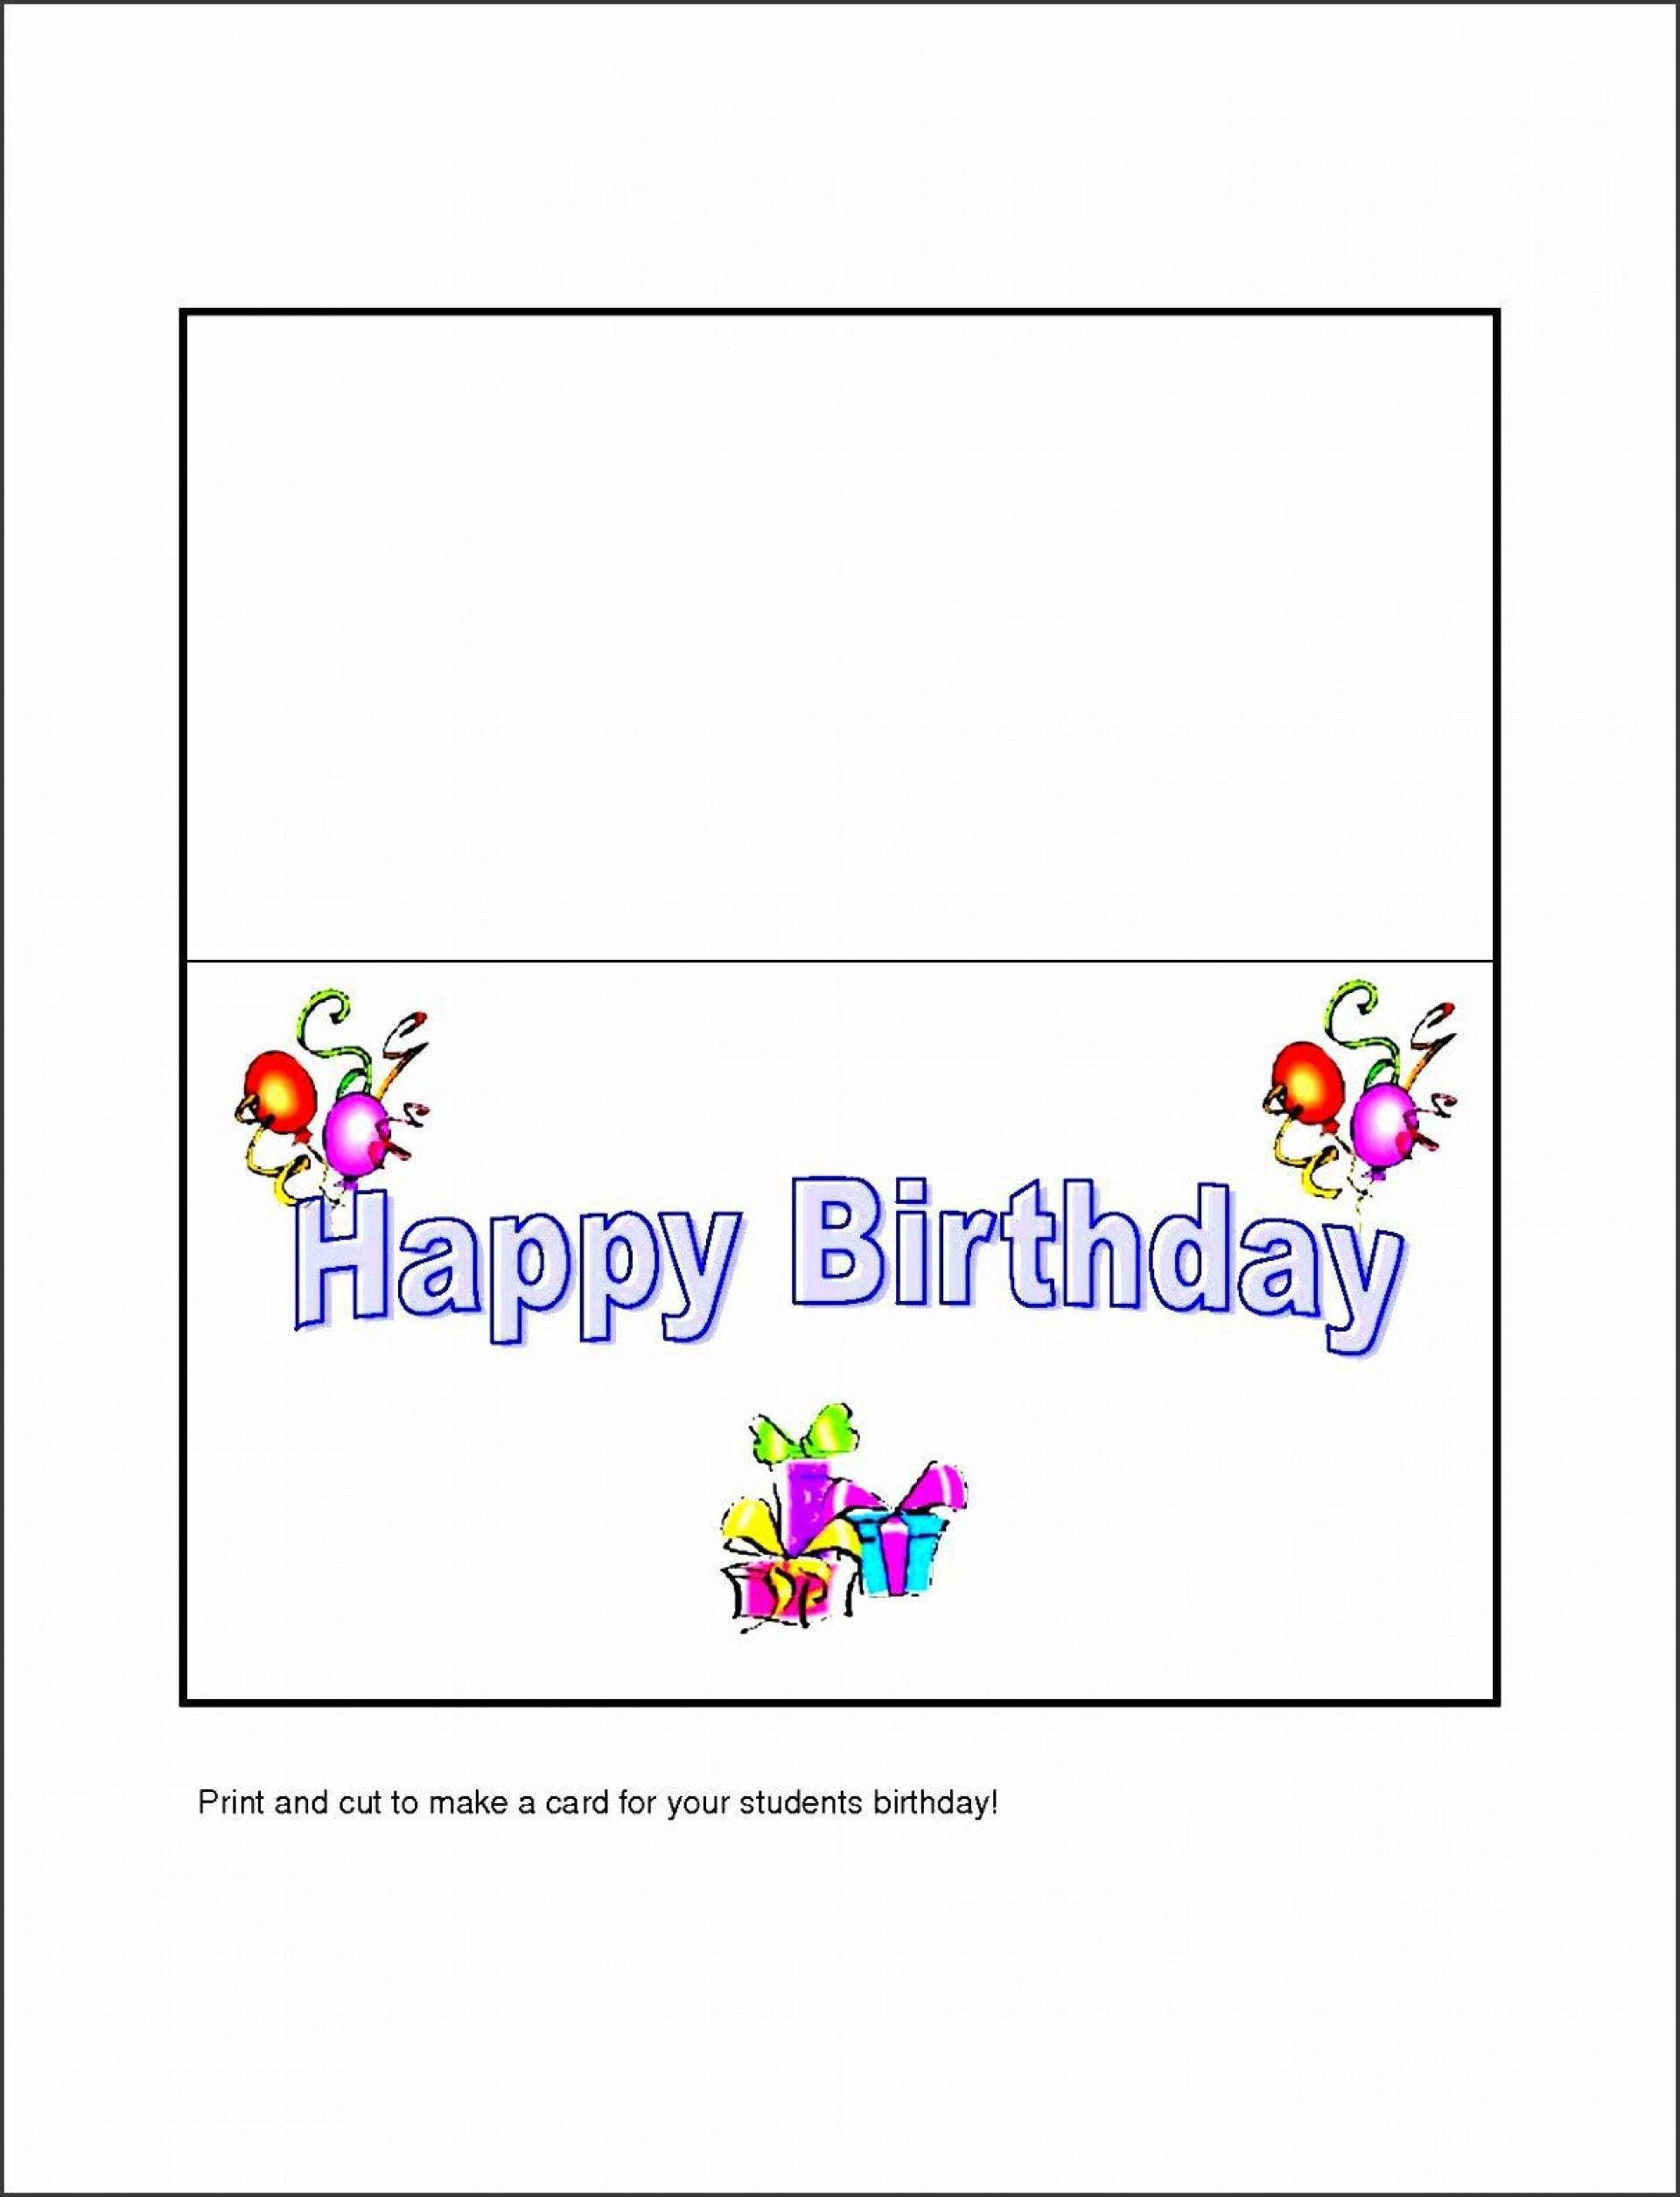 007 Amazing Microsoft Word Greeting Card Template Design  2003 Birthday Download1920